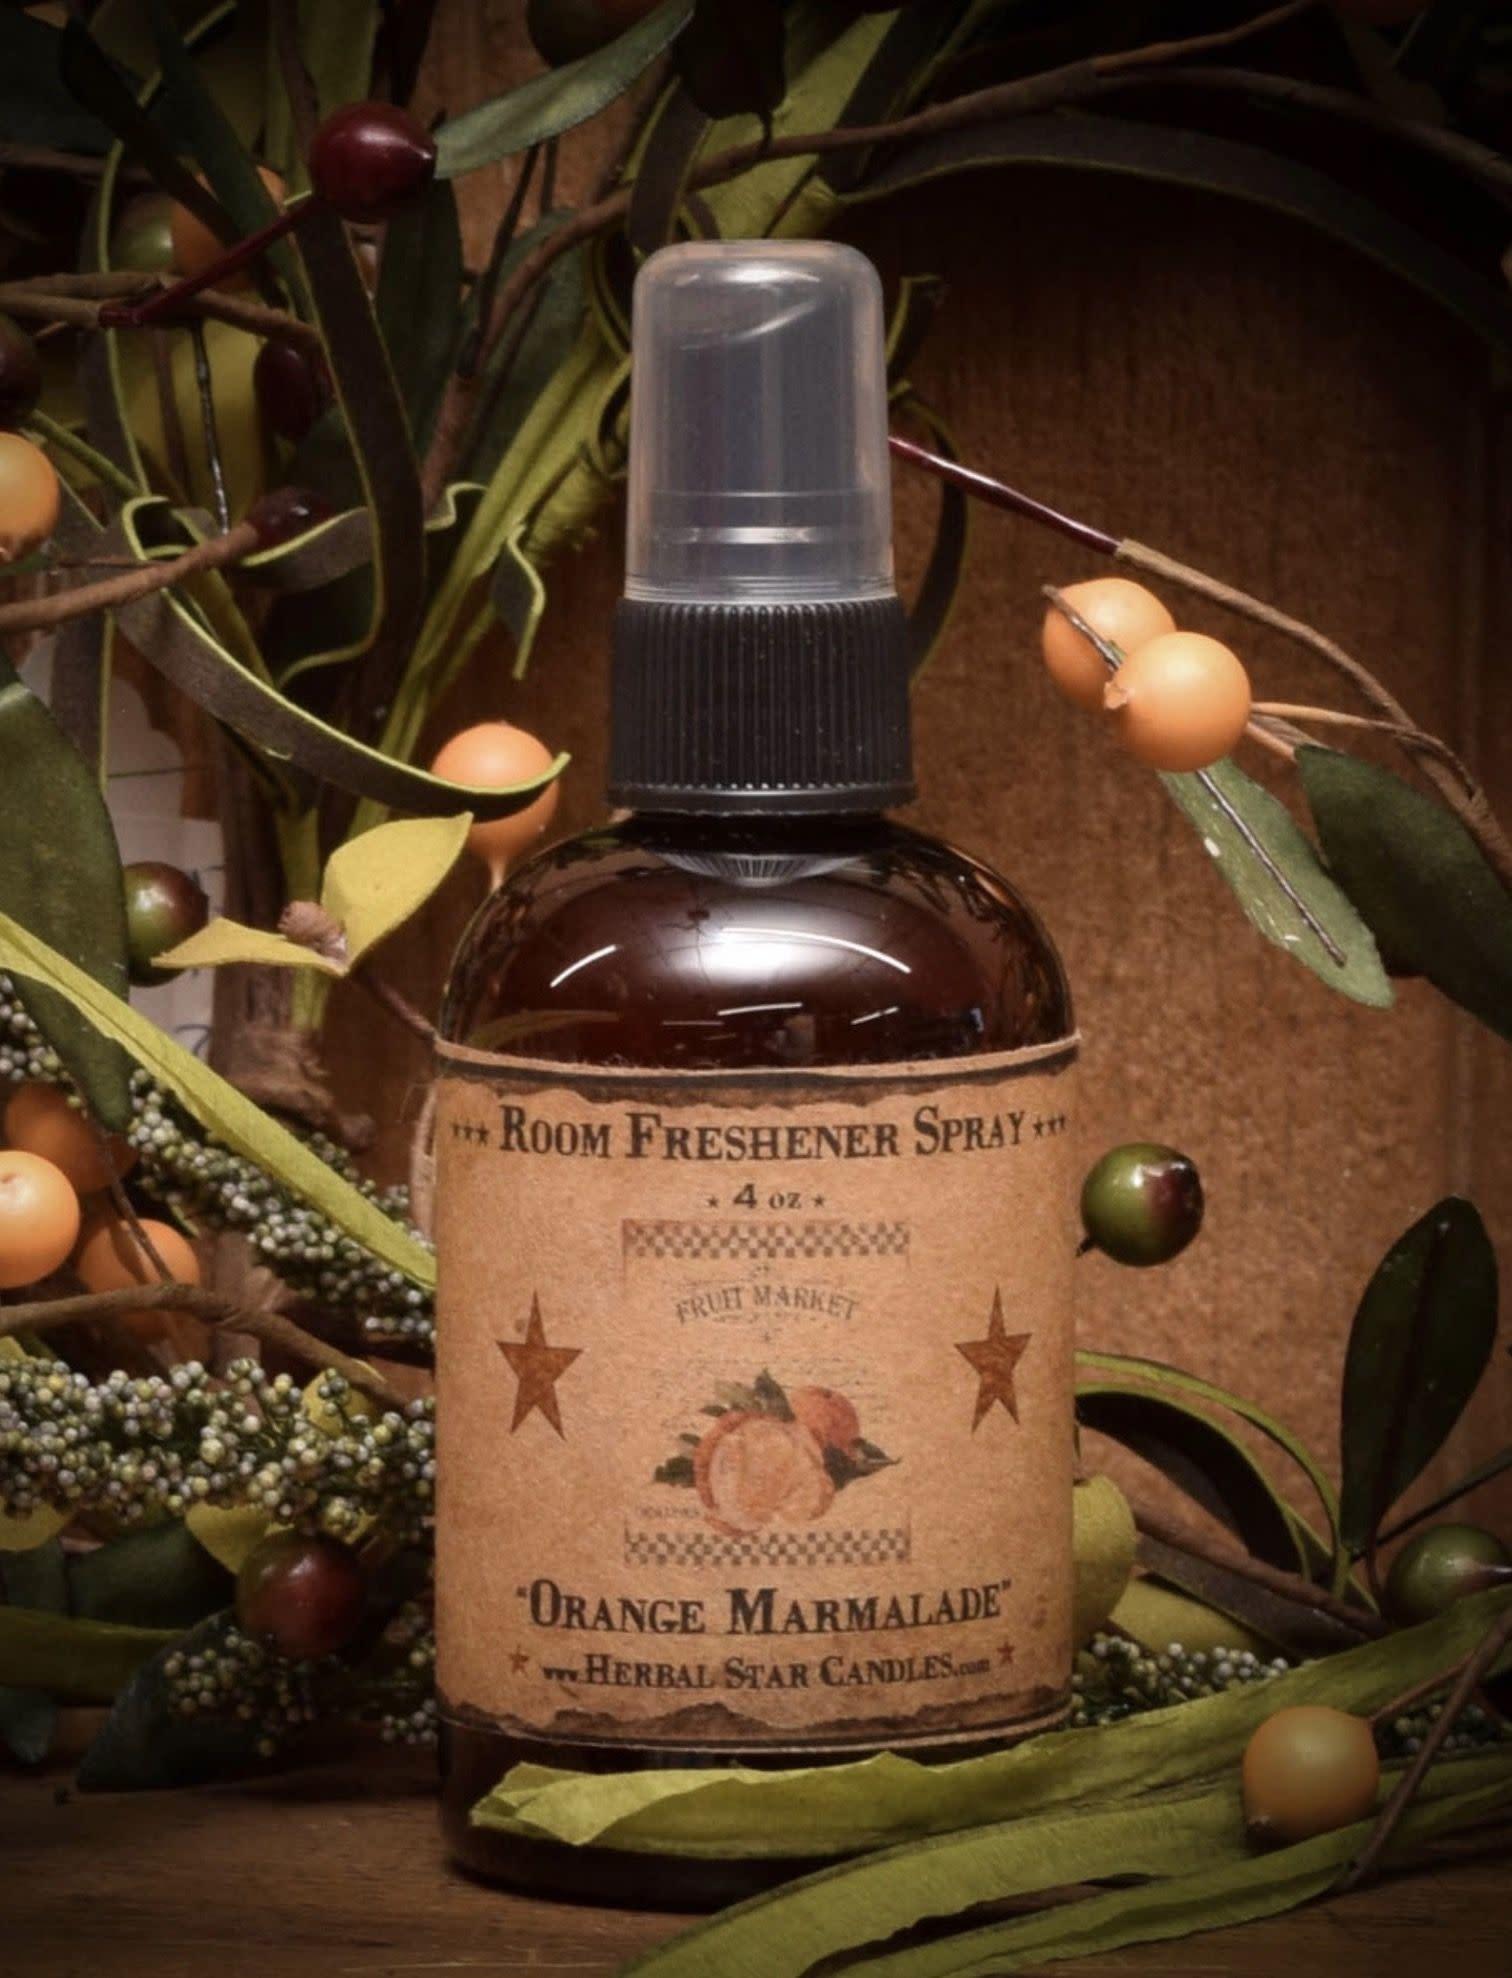 Herbal Star Candles Orange Marmalade Room Spray - 4oz